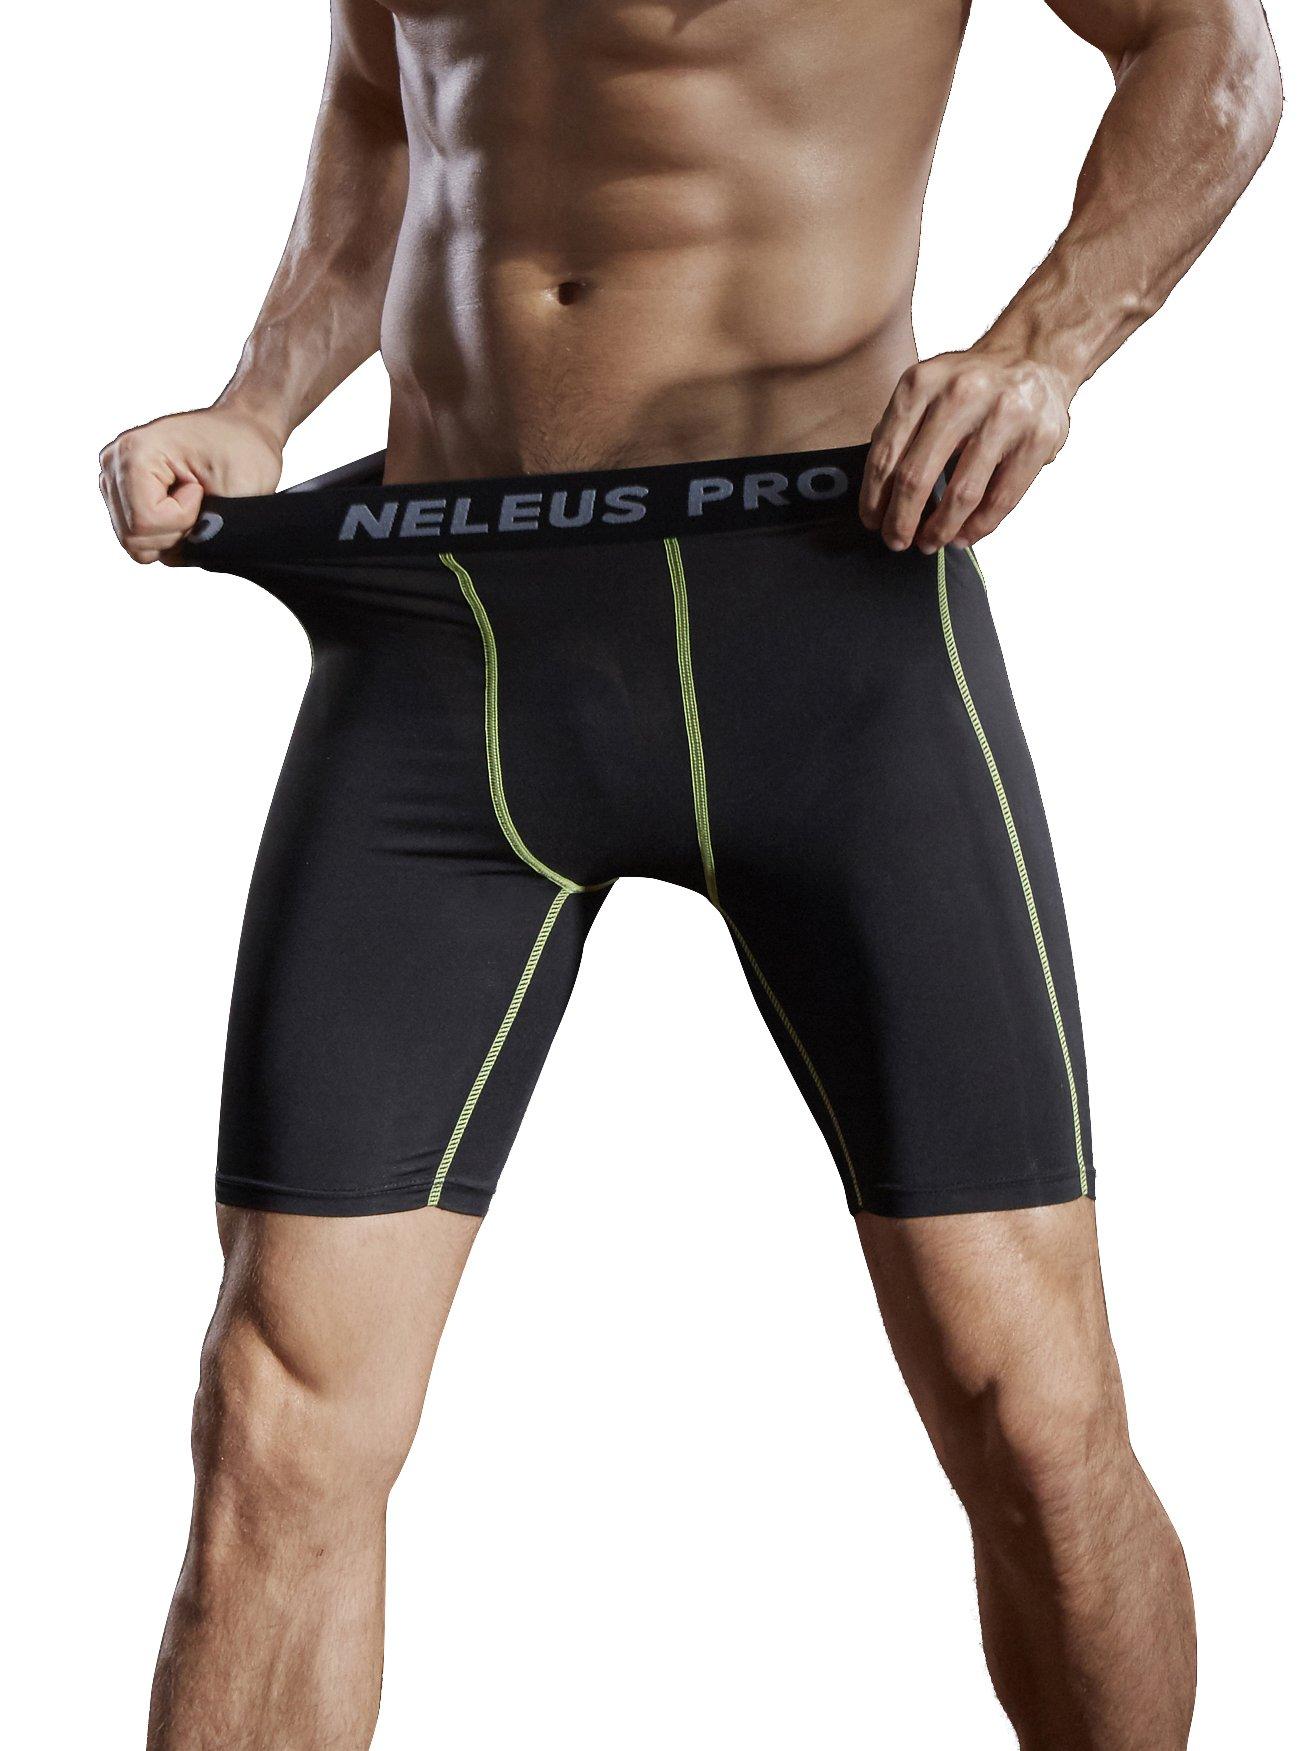 Neleus Men's 3 Pack Compression Short,047,Black,US S,EU M by Neleus (Image #6)